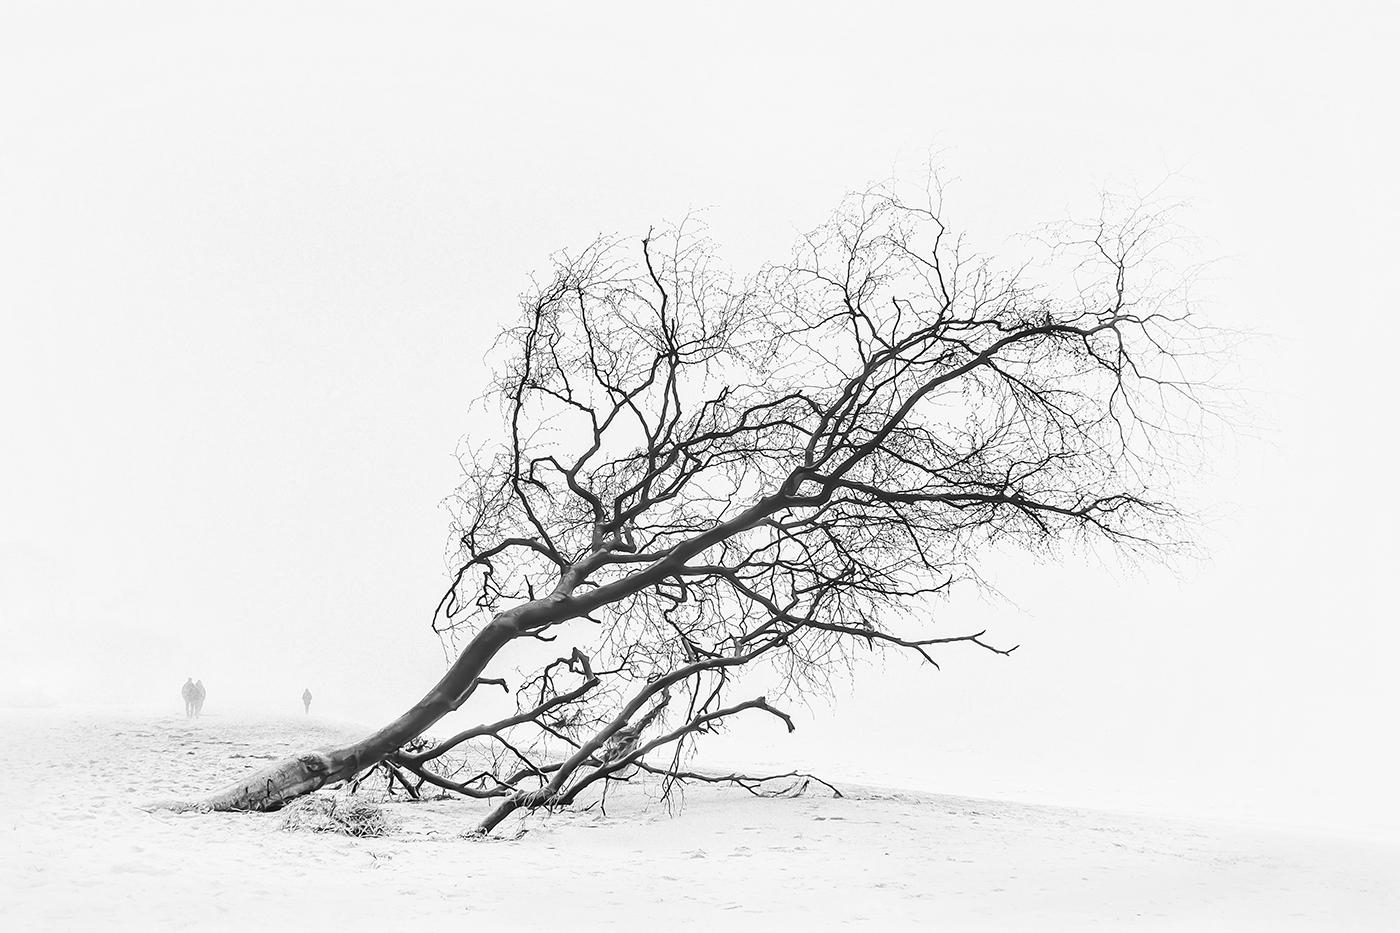 Nebel am Weststrand | © Sonja Molter